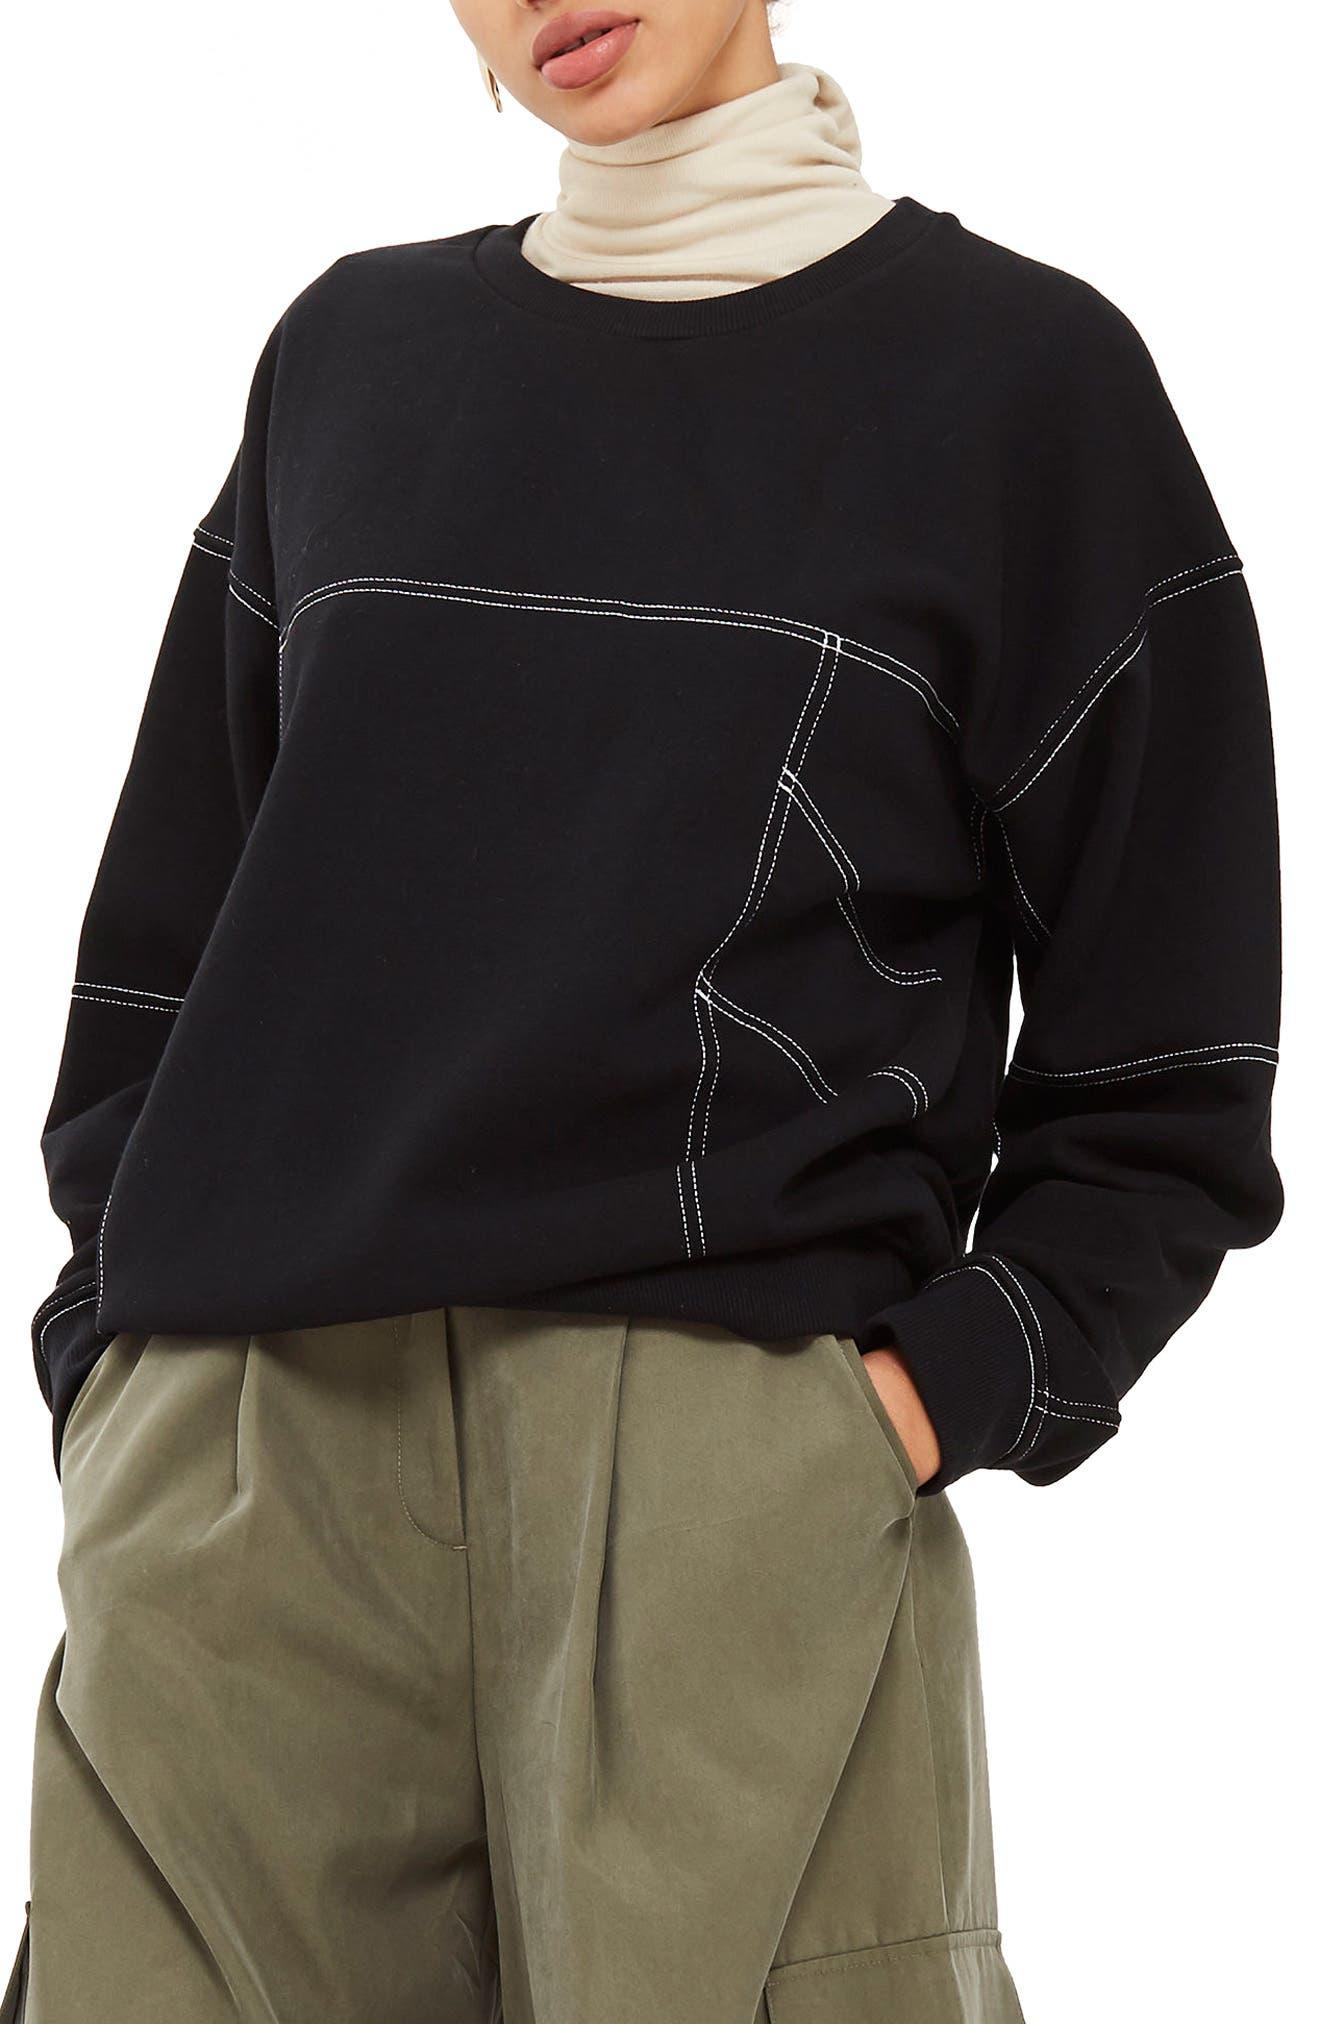 Stab Stitch Detail Sweatshirt,                             Main thumbnail 1, color,                             001